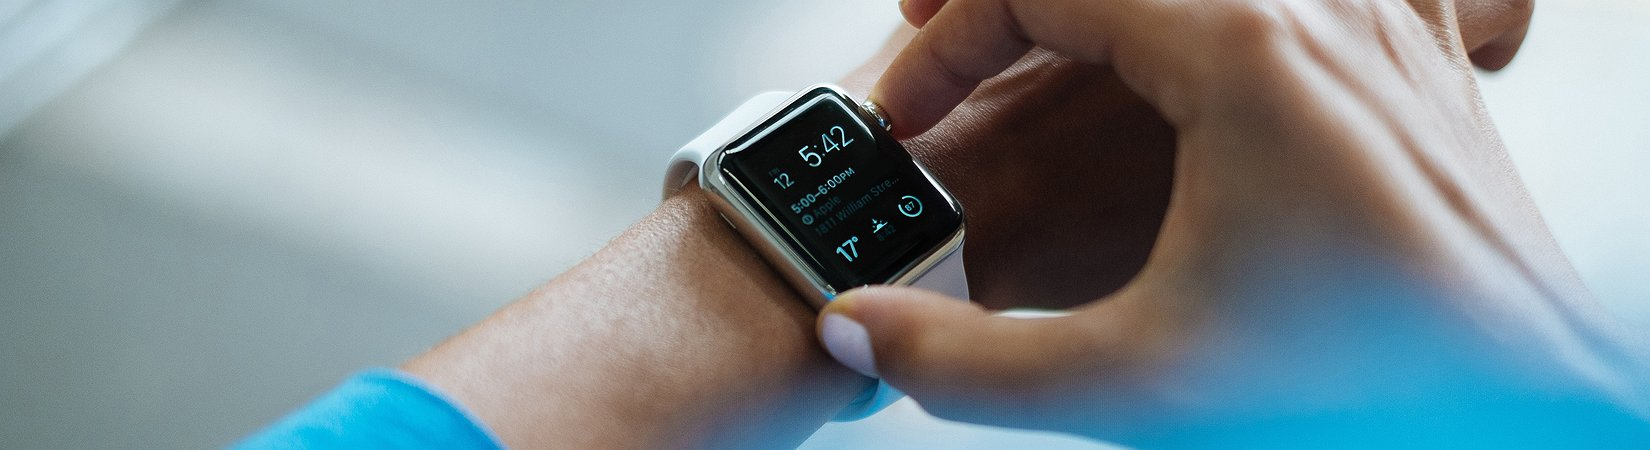 От Seiko до Apple: Эволюция смарт-часов